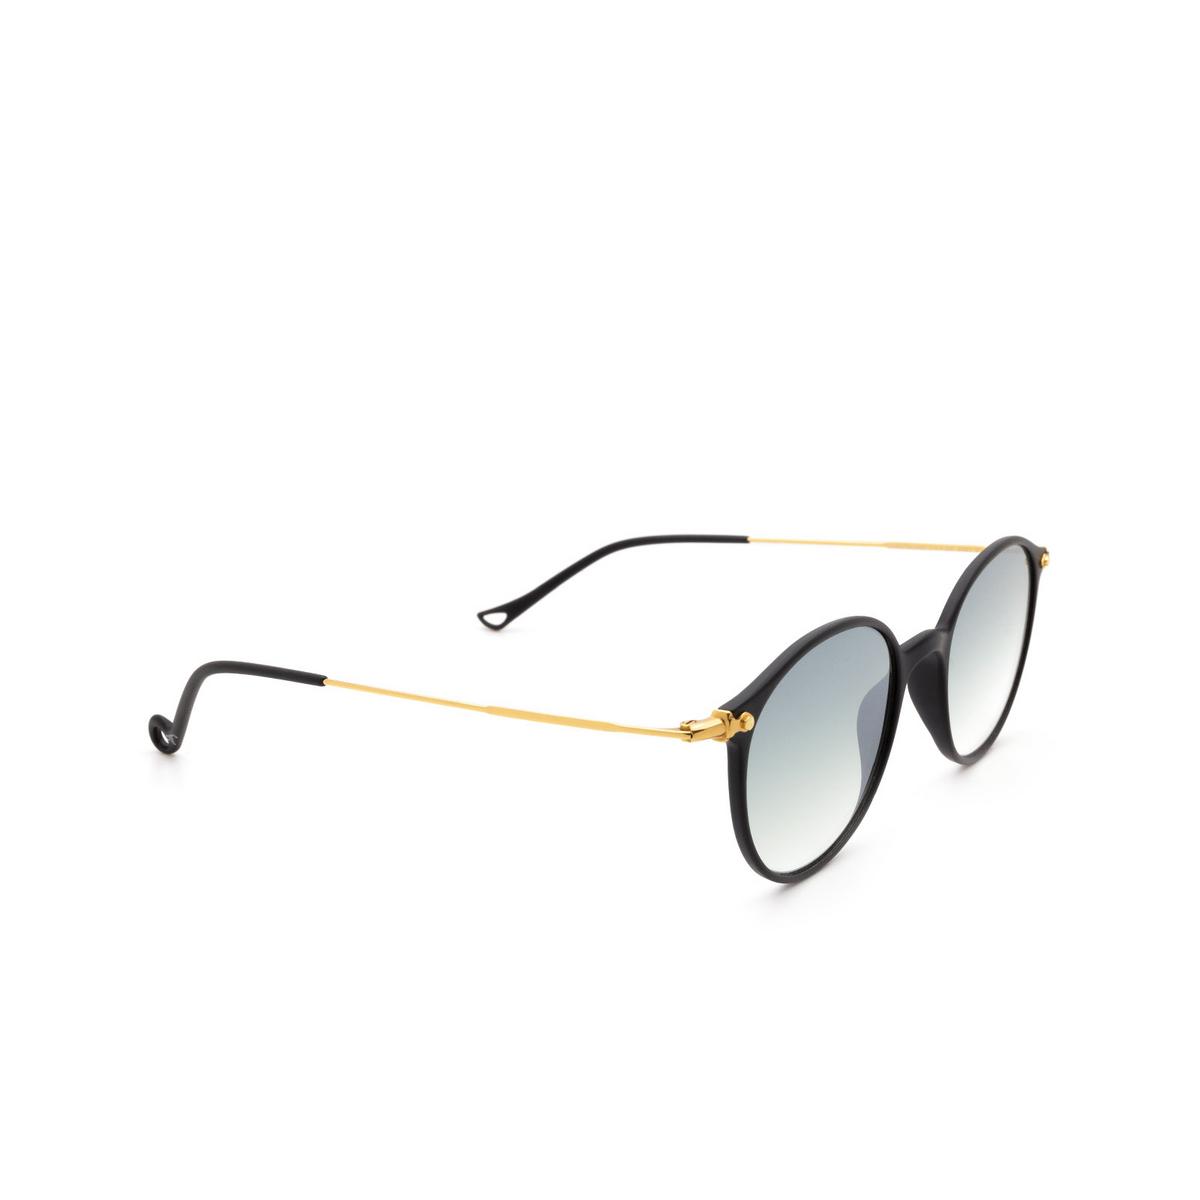 Eyepetizer® Round Sunglasses: Longisland color Black C.A-4-25F - three-quarters view.